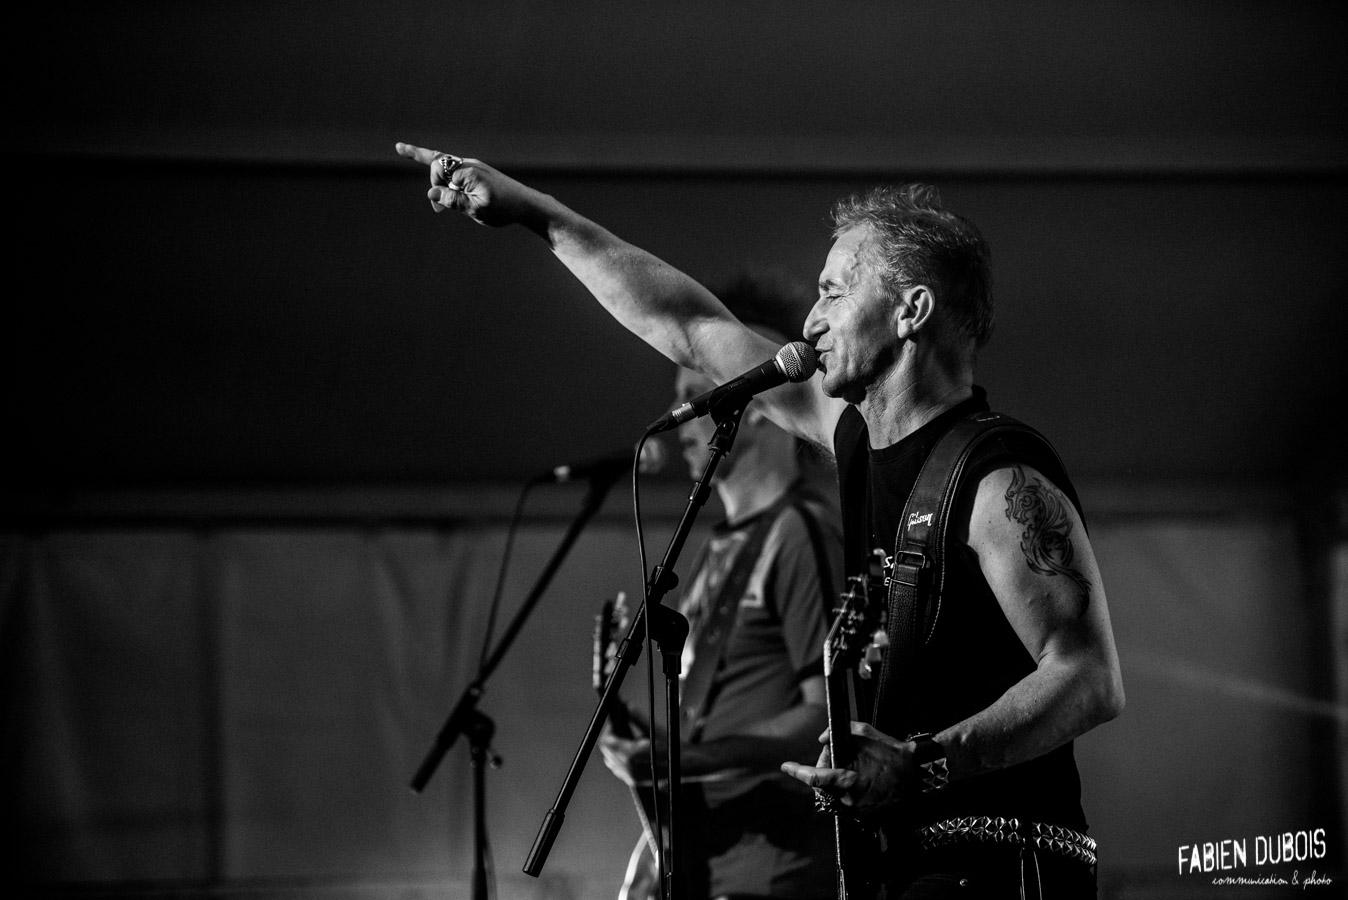 Photo Les Sales Majestés Europopcon Festival Mervans Samedi 2018